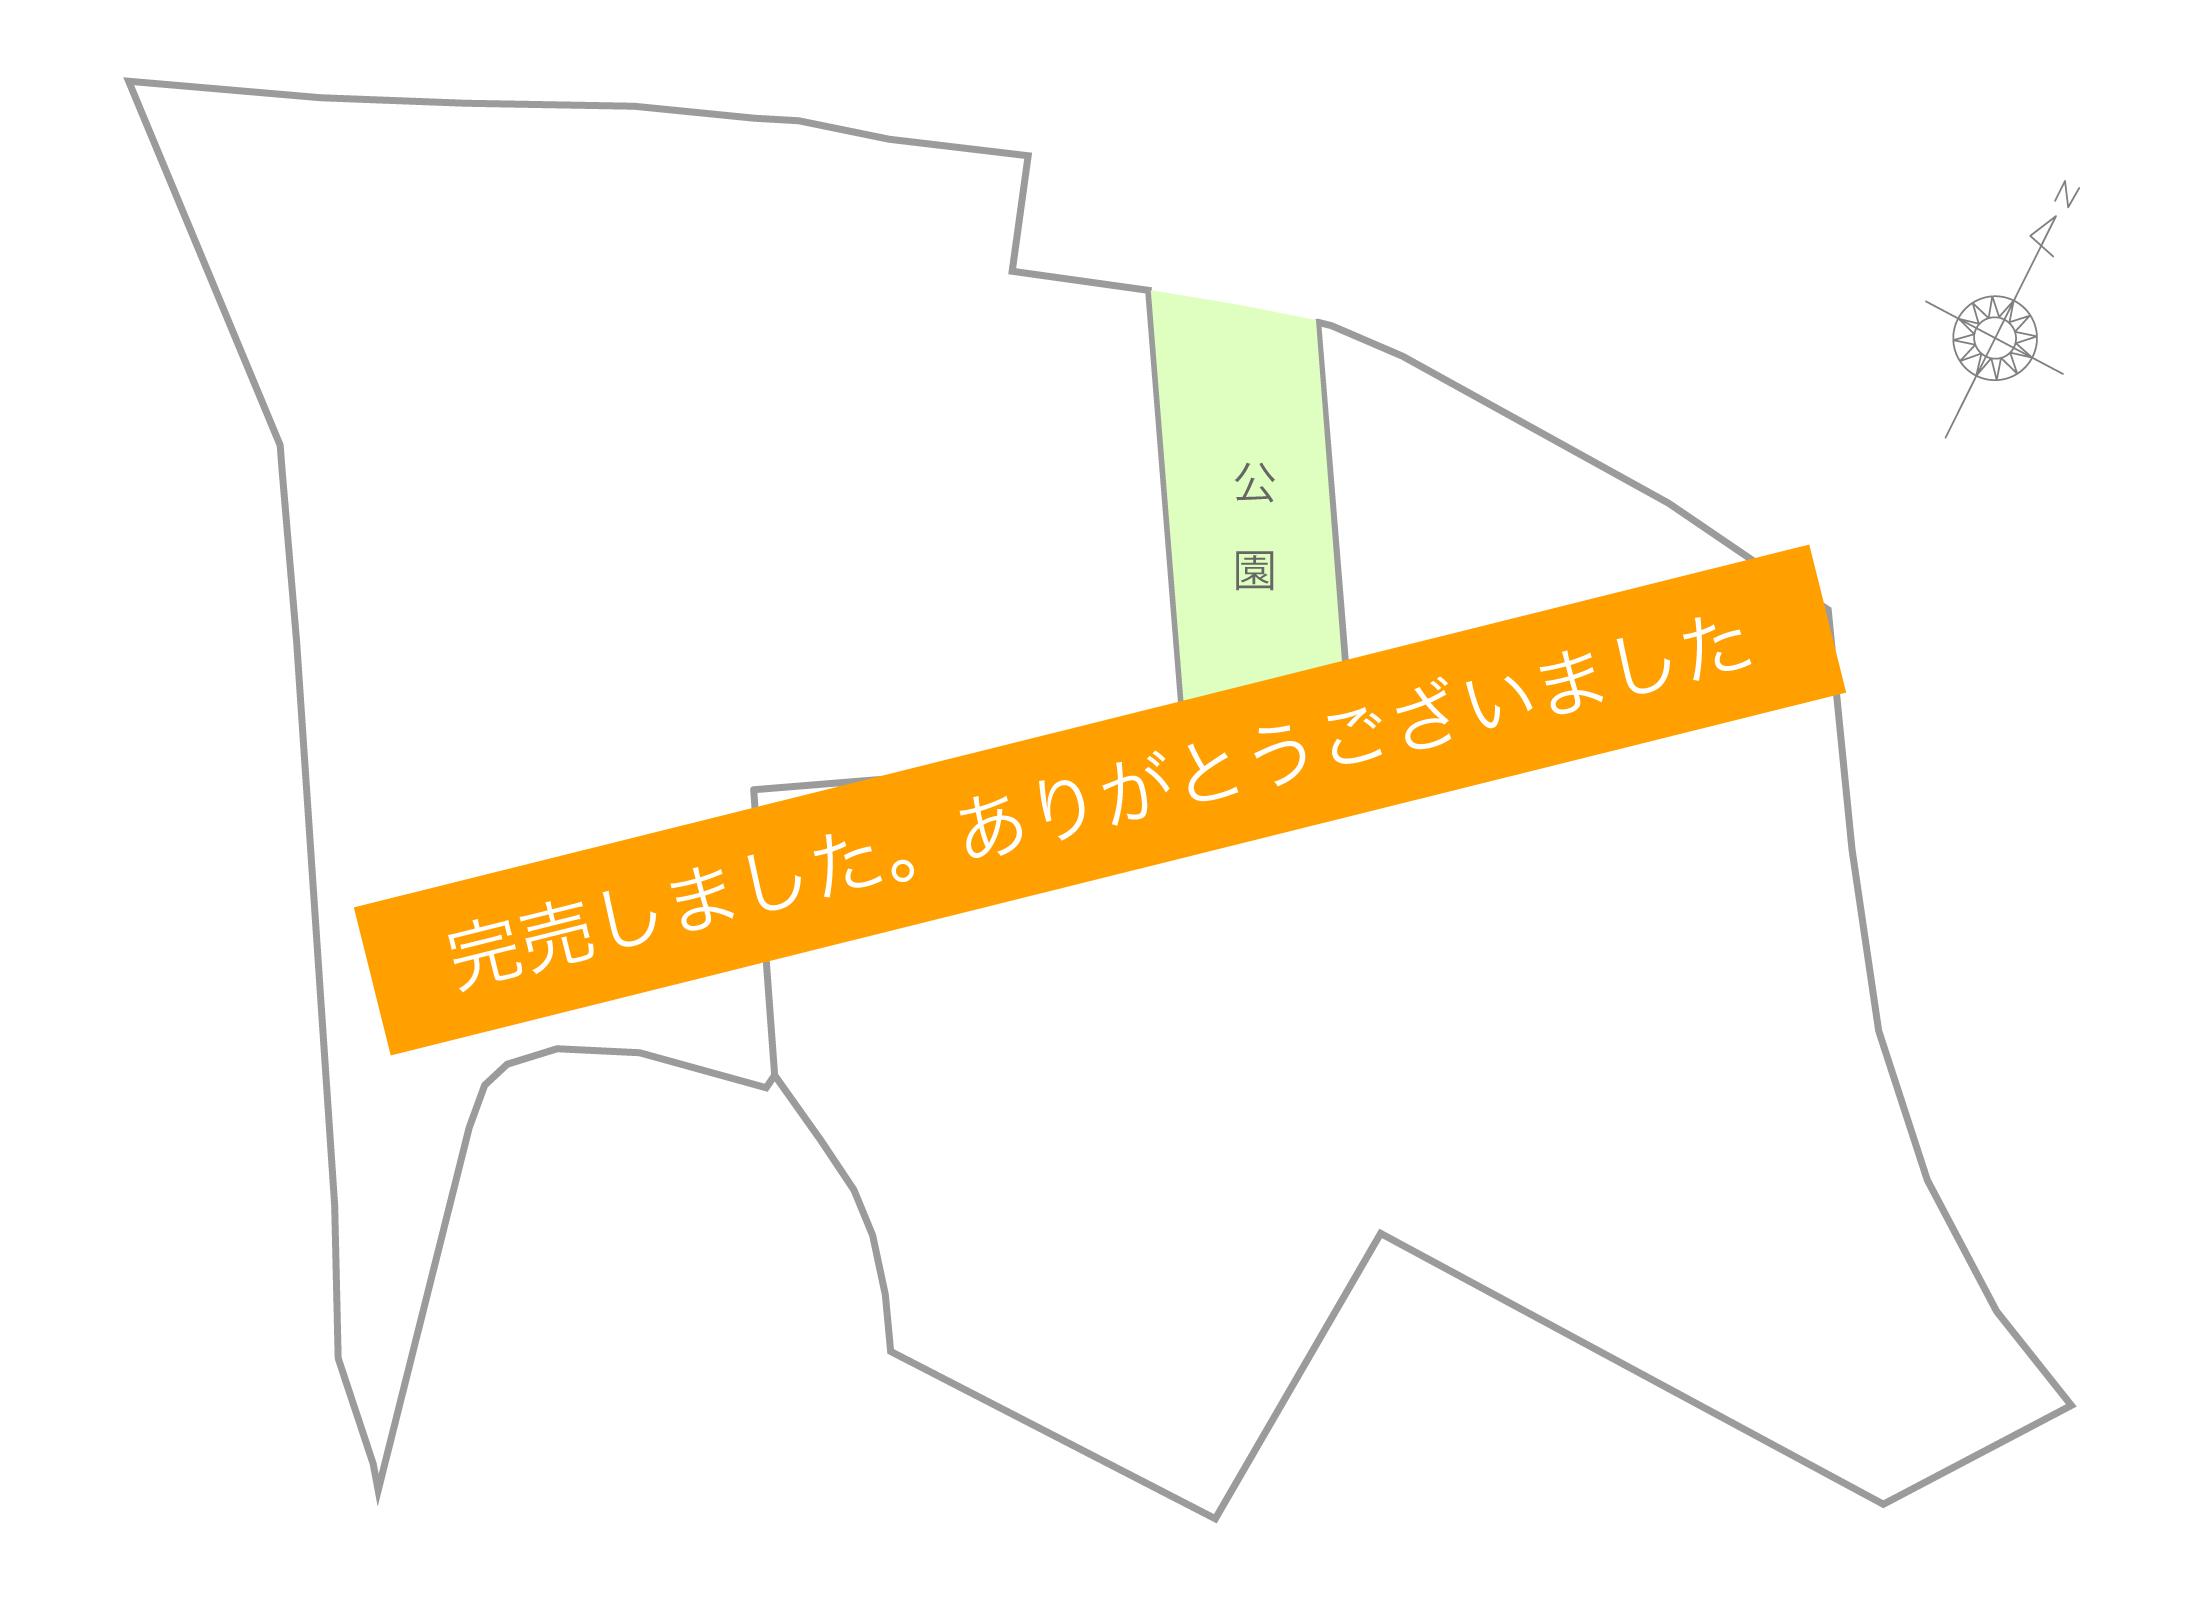 丸亀市津森町7期(アパート用地)